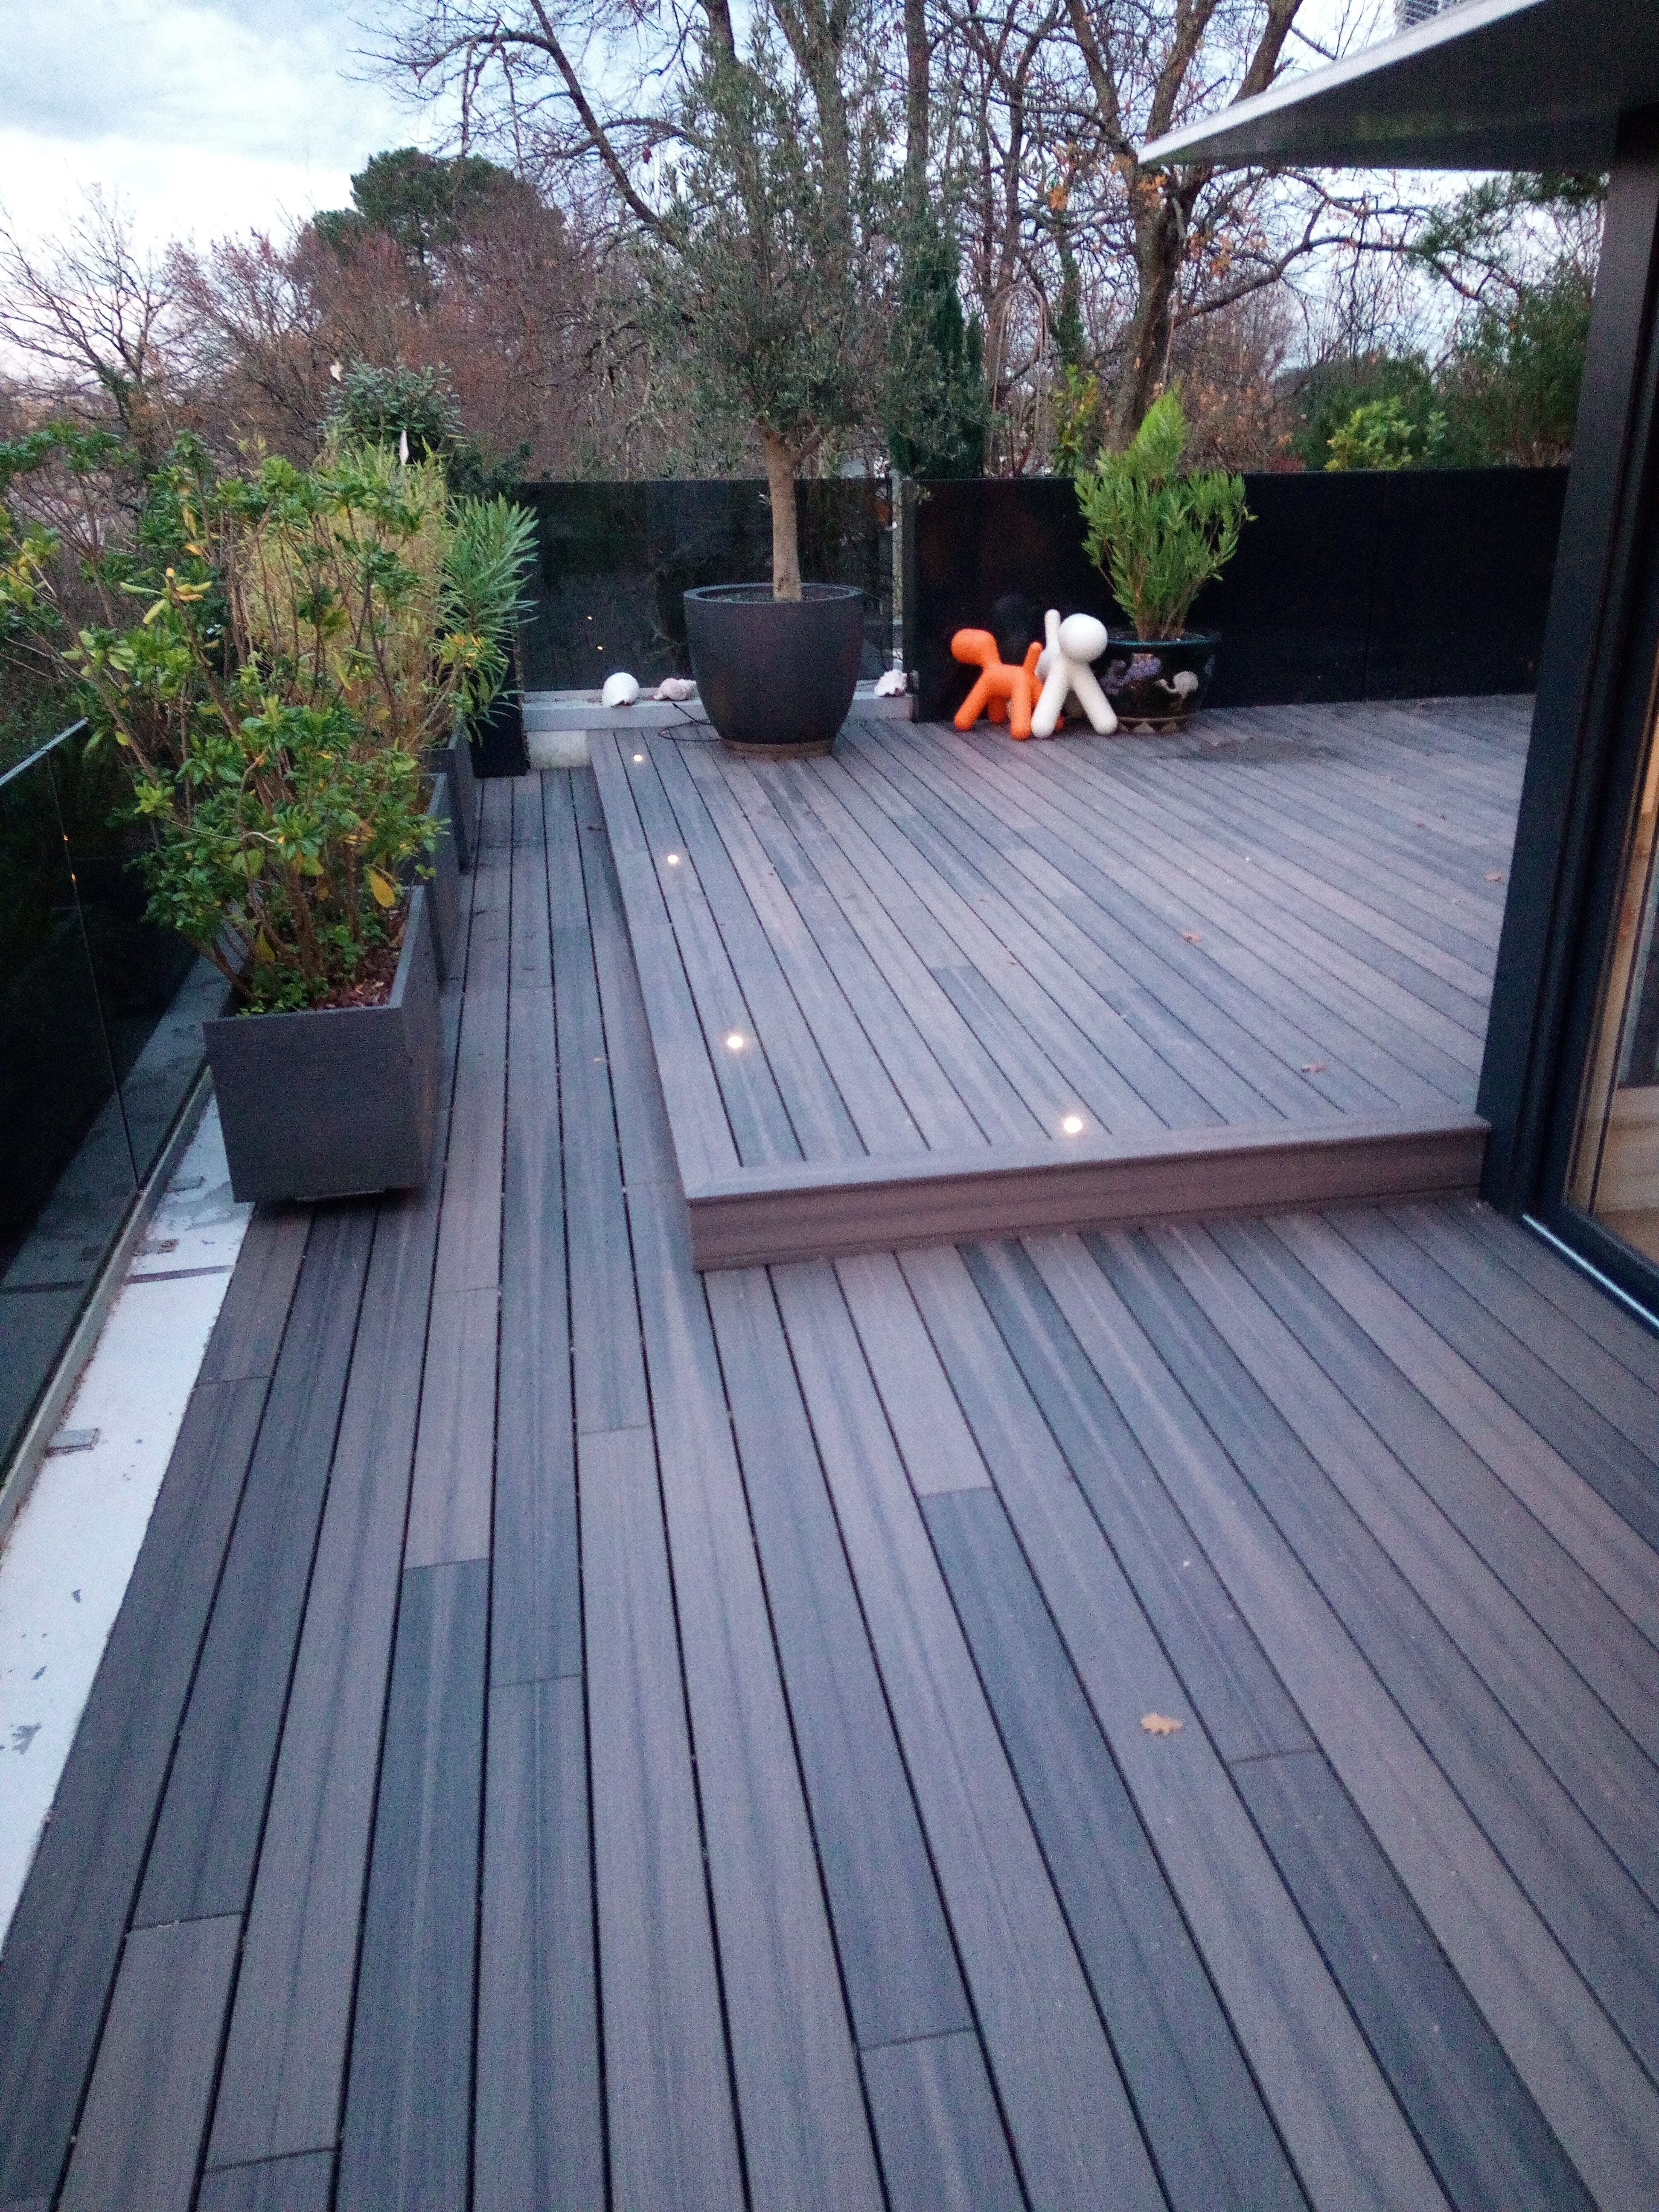 Spots Et Terrasse Composite Terrasse Composite Amenagement Jardin Terrasse Bois